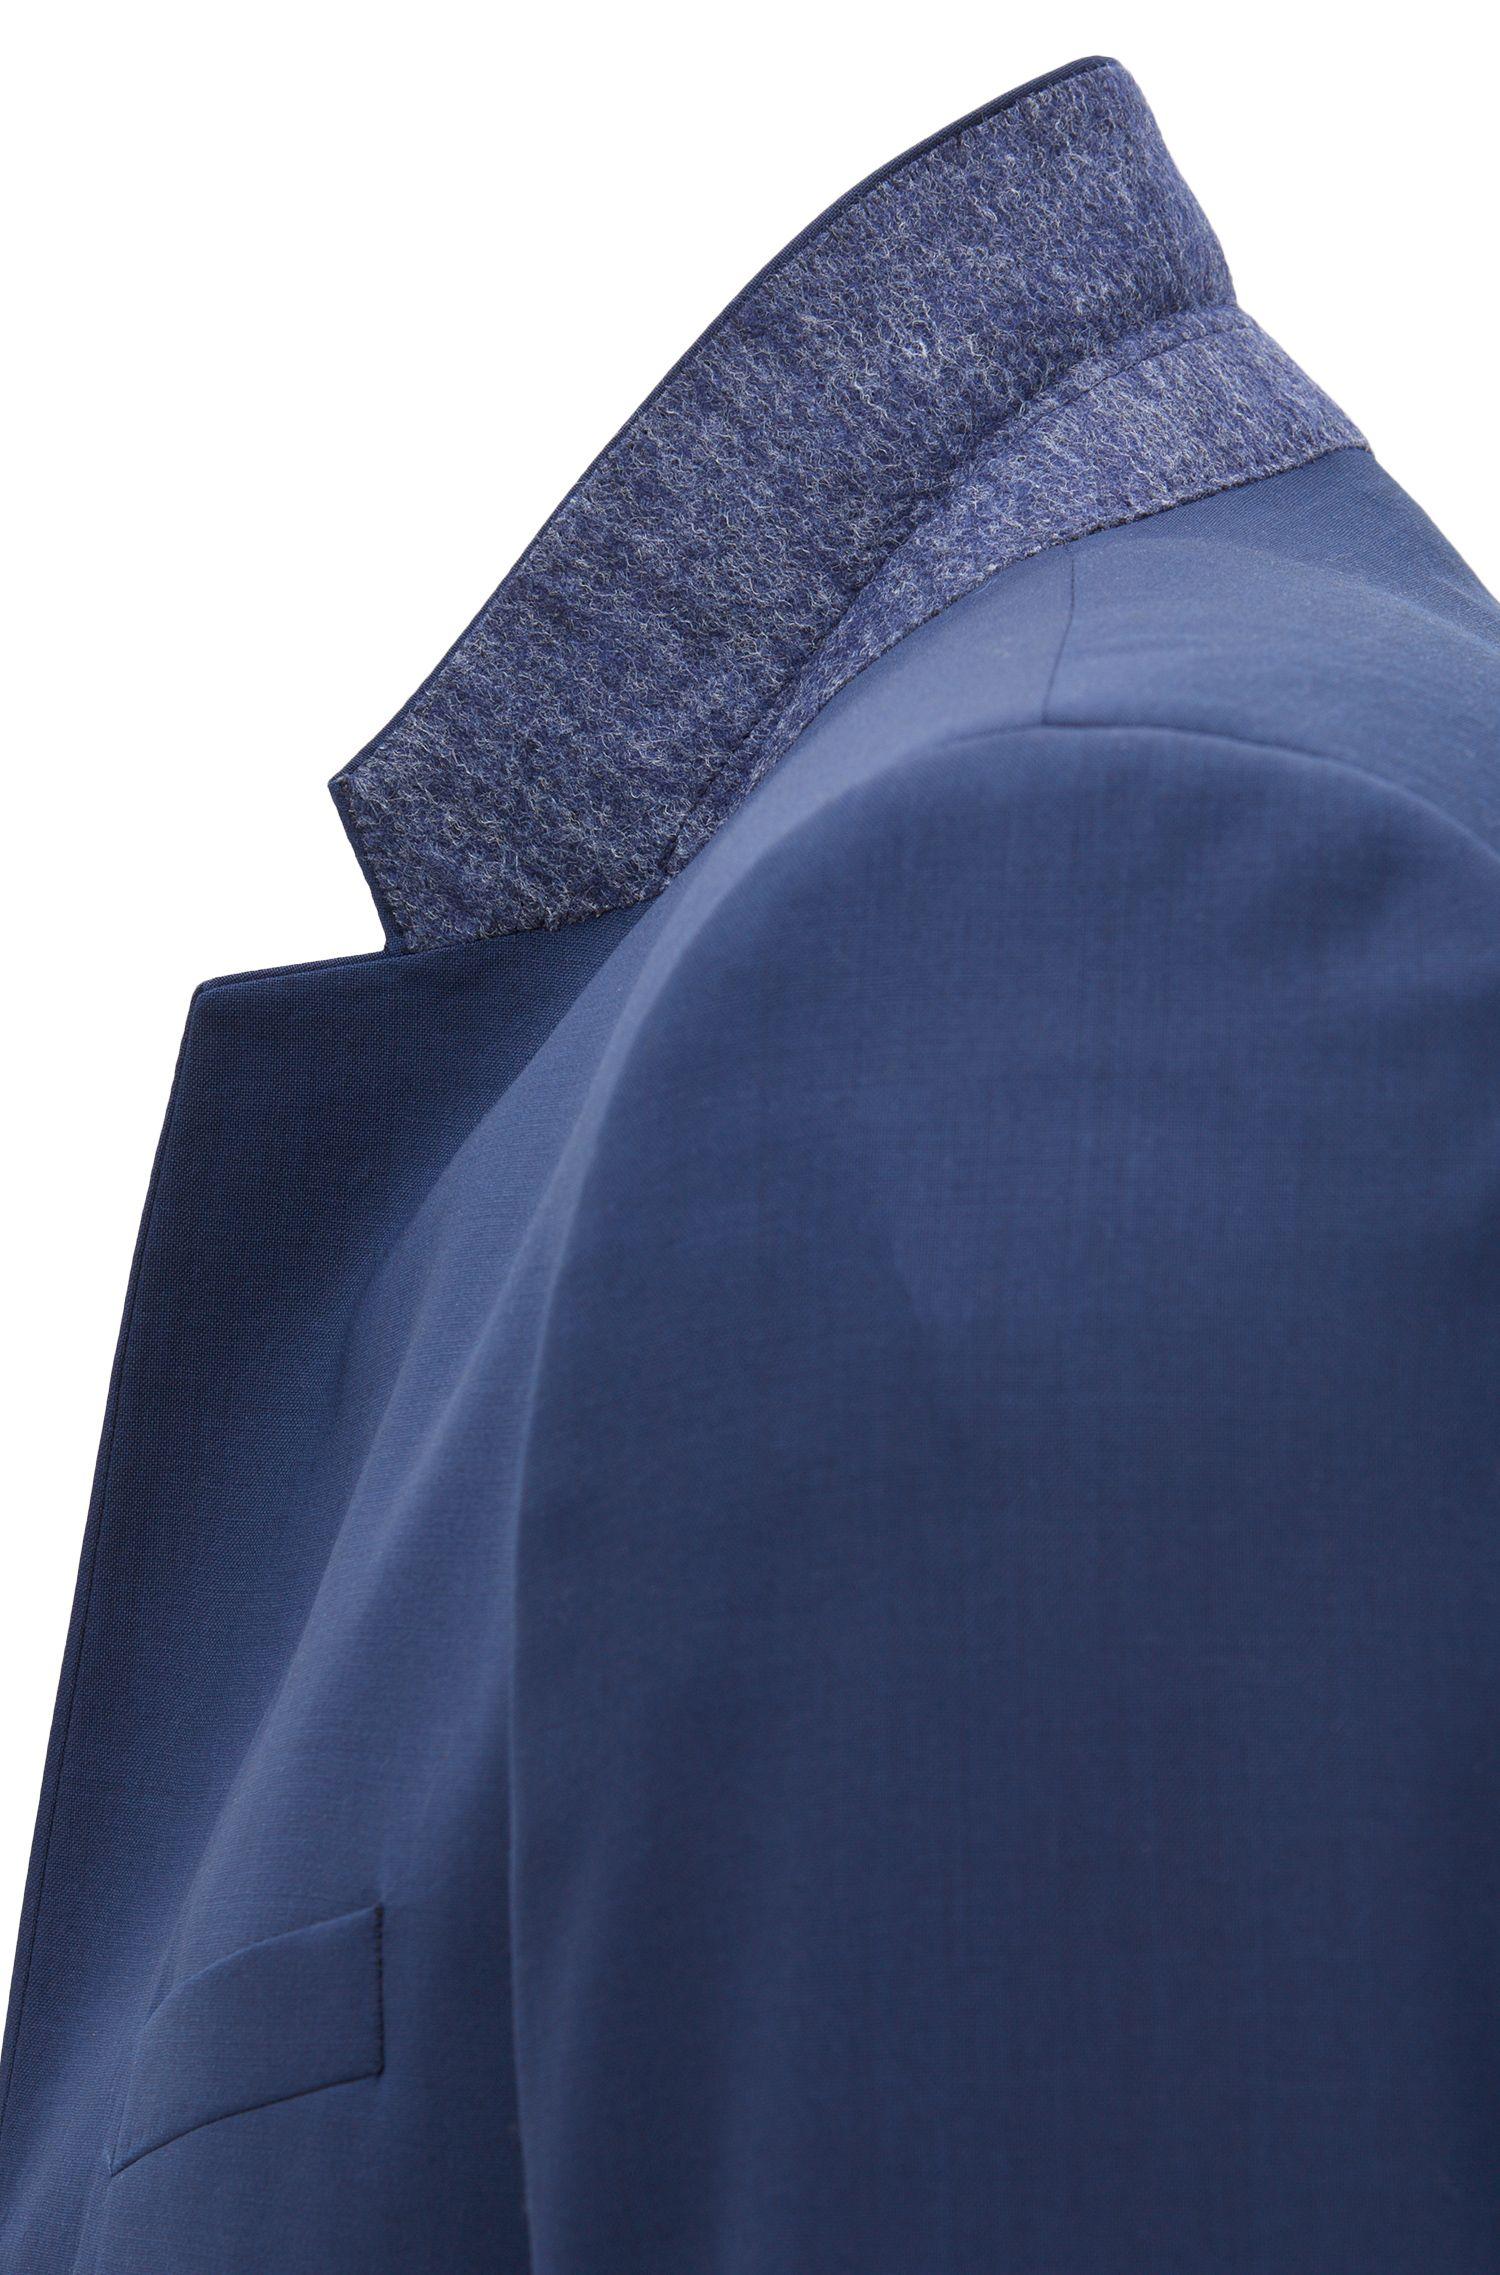 Giacca extra slim fit in lana vergine , Blu